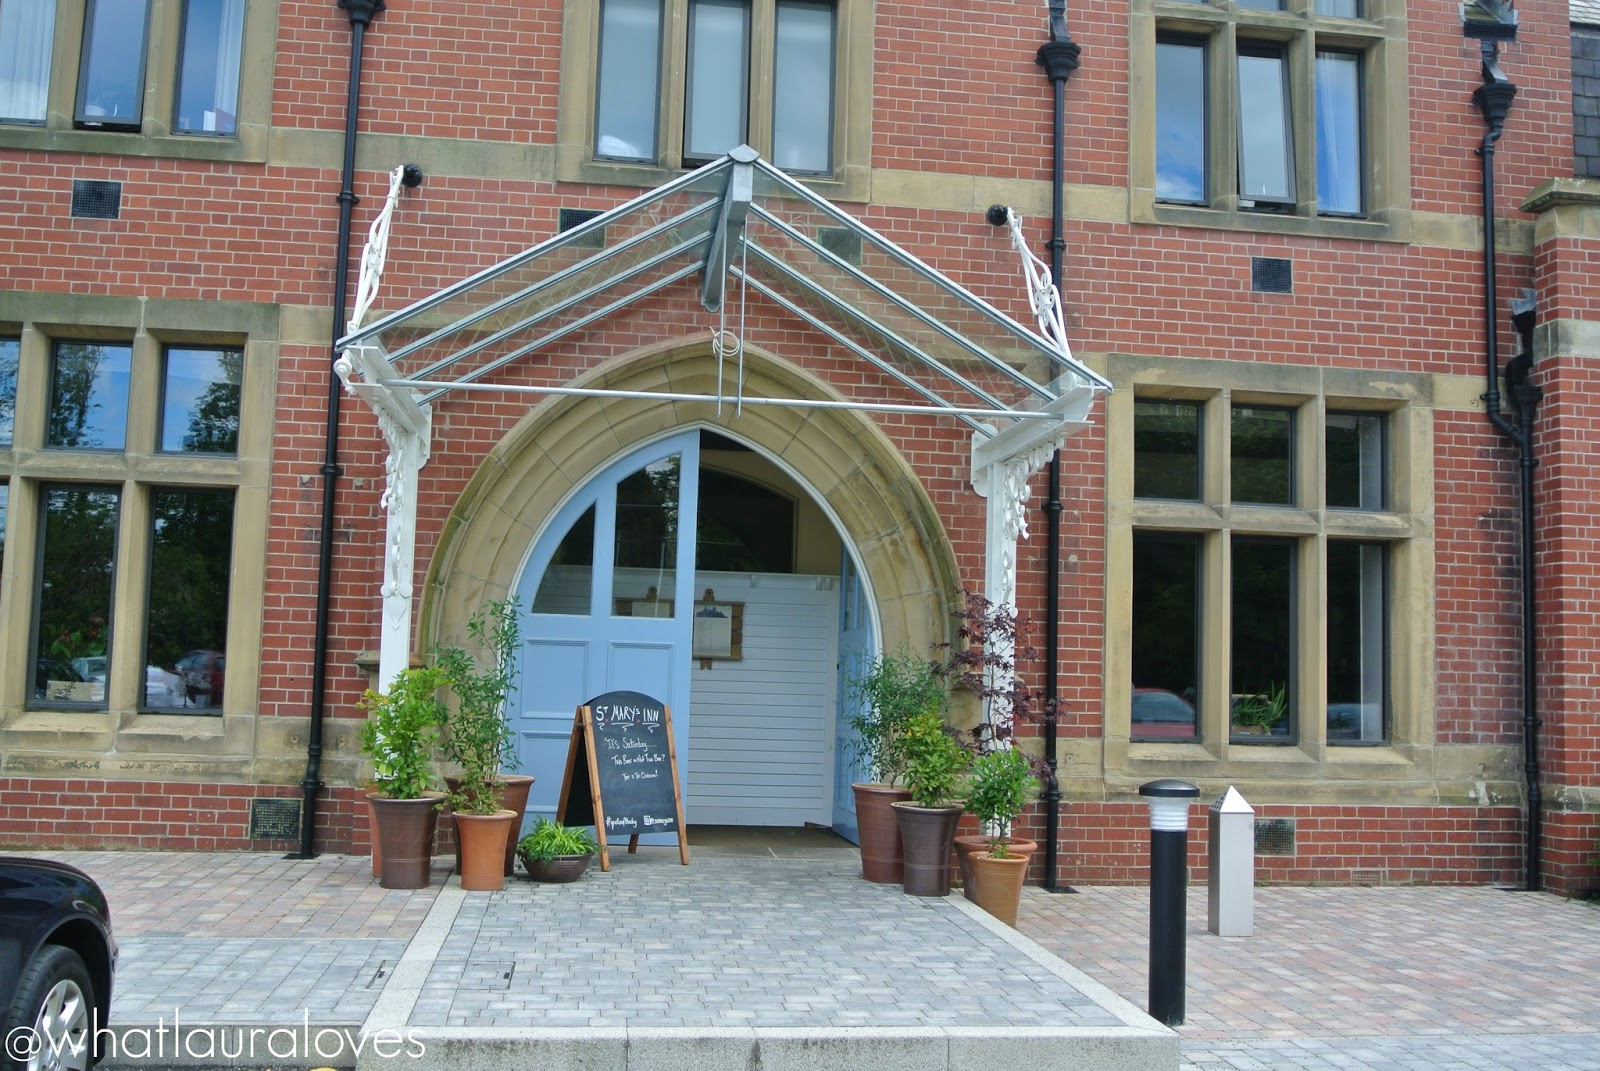 Afternoon Tea at St Mary's Inn Northumberland Morpeth North East Newcastle